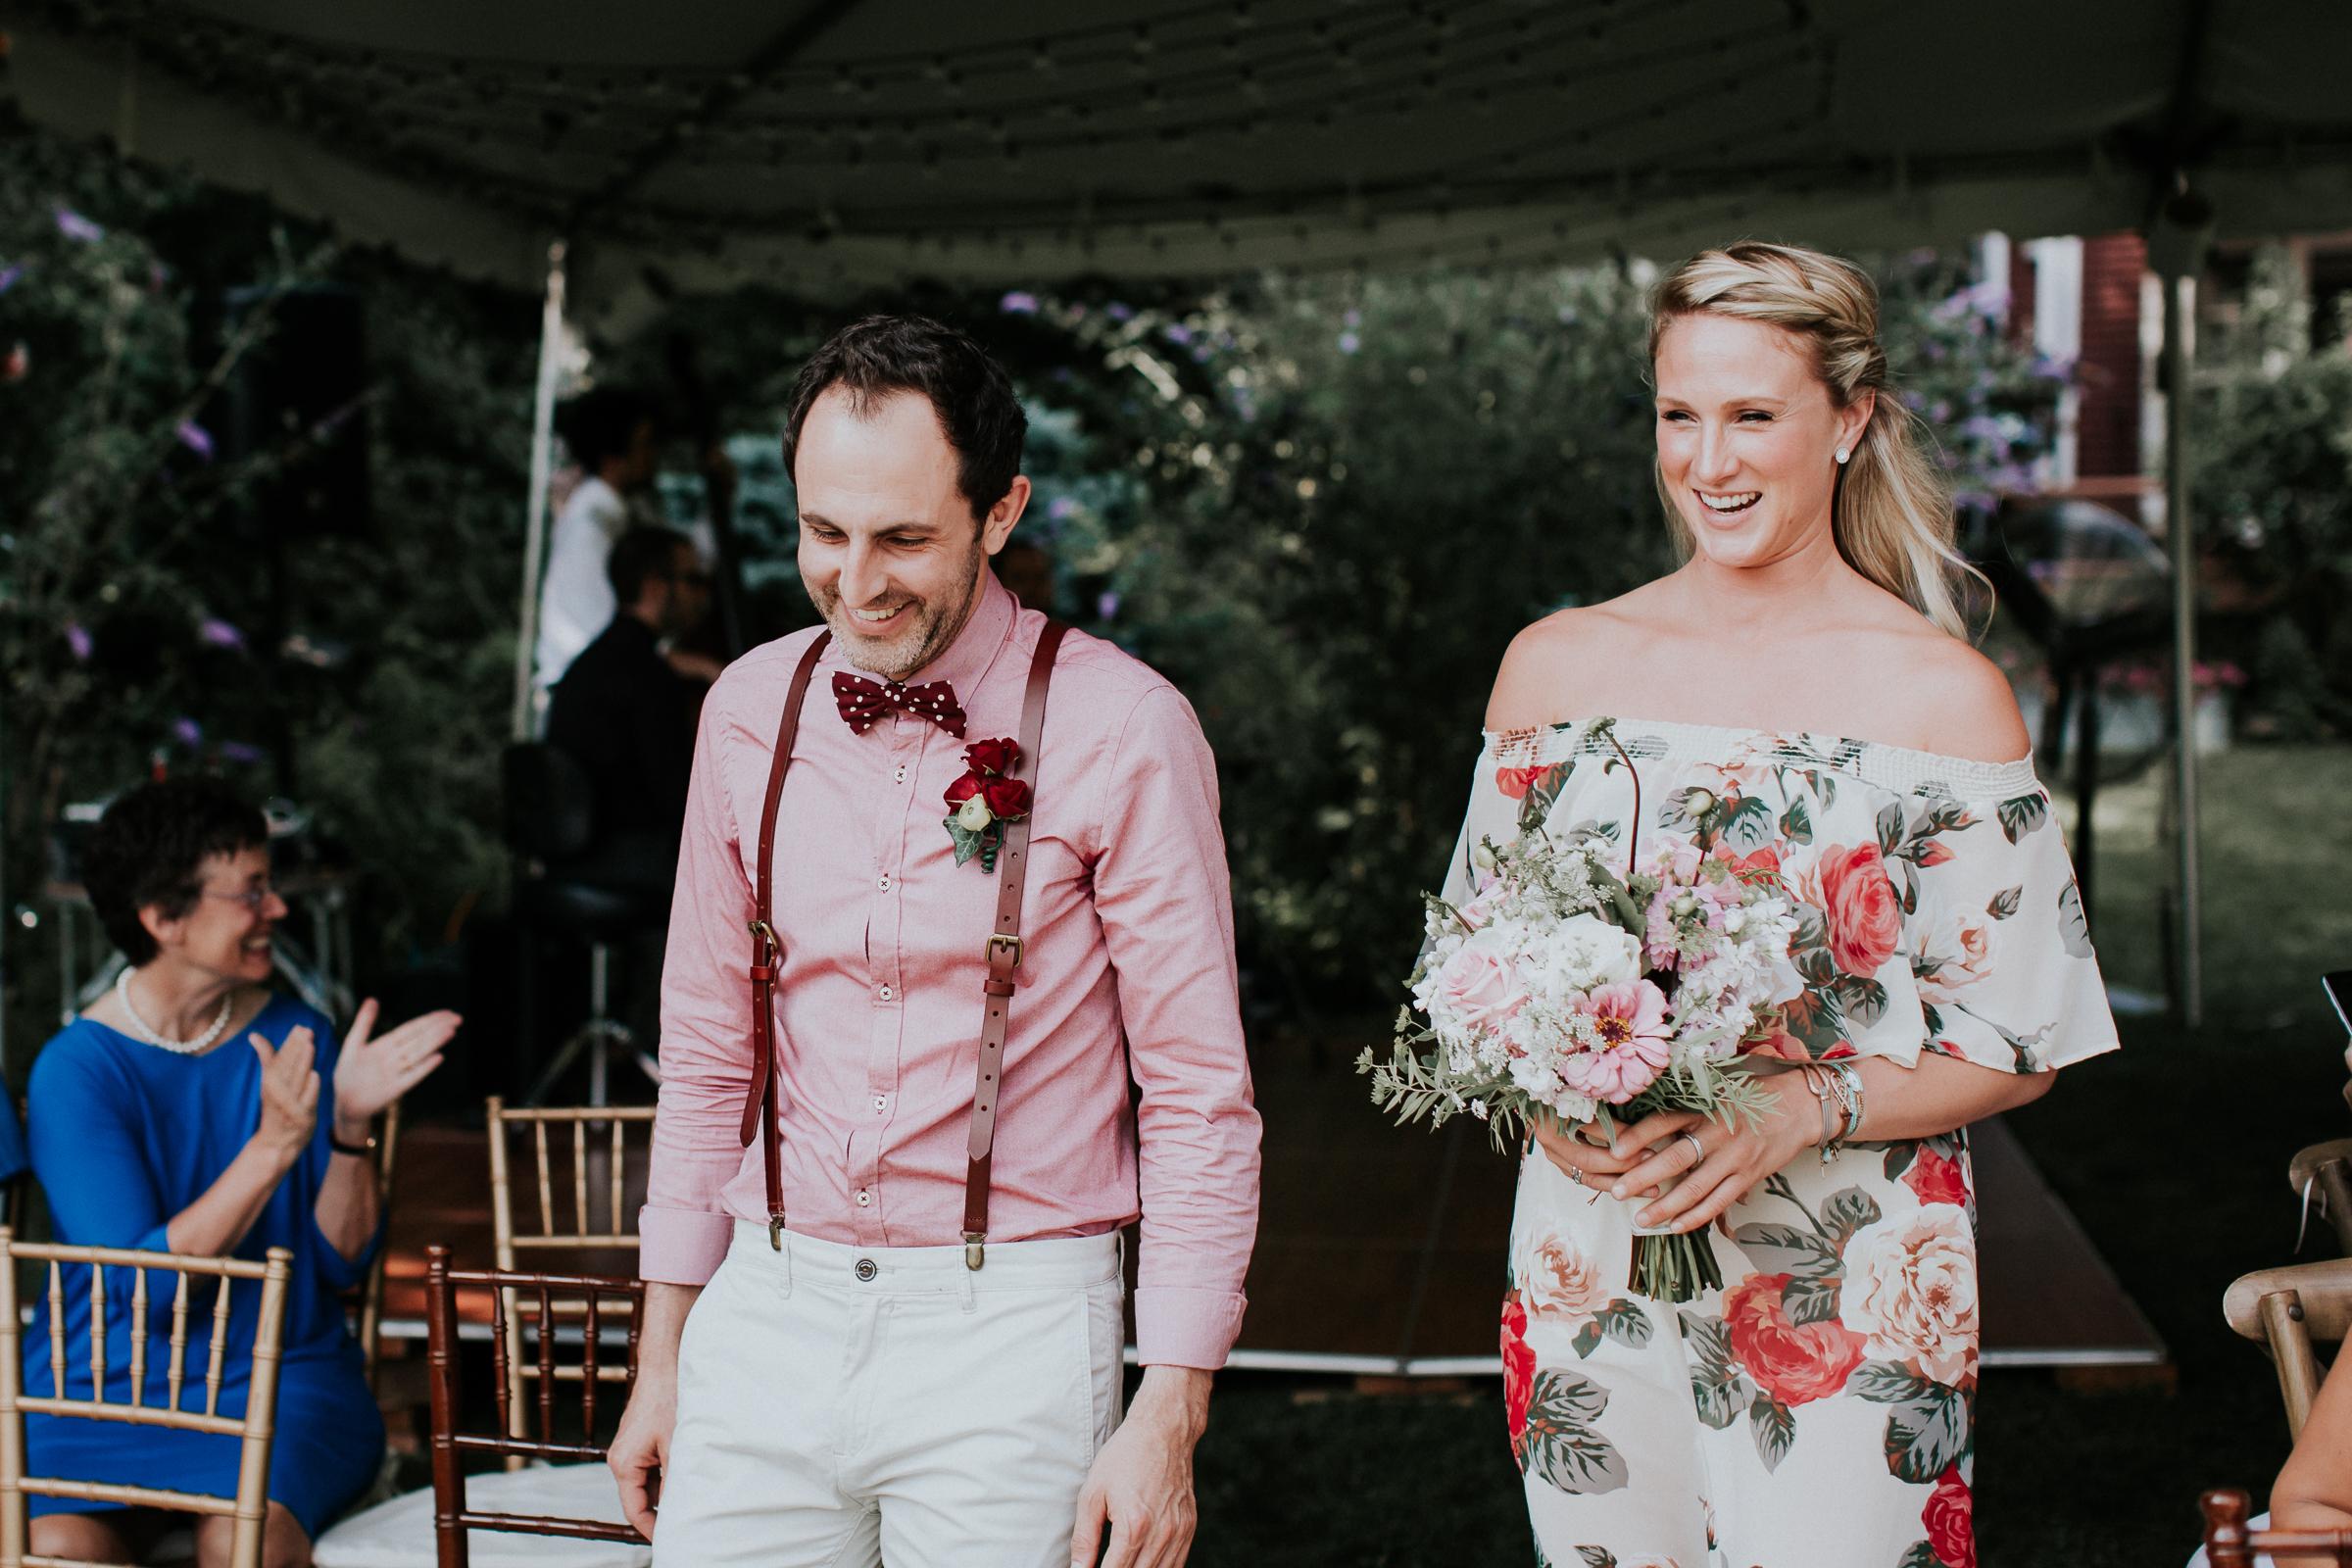 Backyard-Intimate-Adventurous-Destination-Wedding-Darien-Connecticut-Documentary-Wedding-Photography-50.jpg